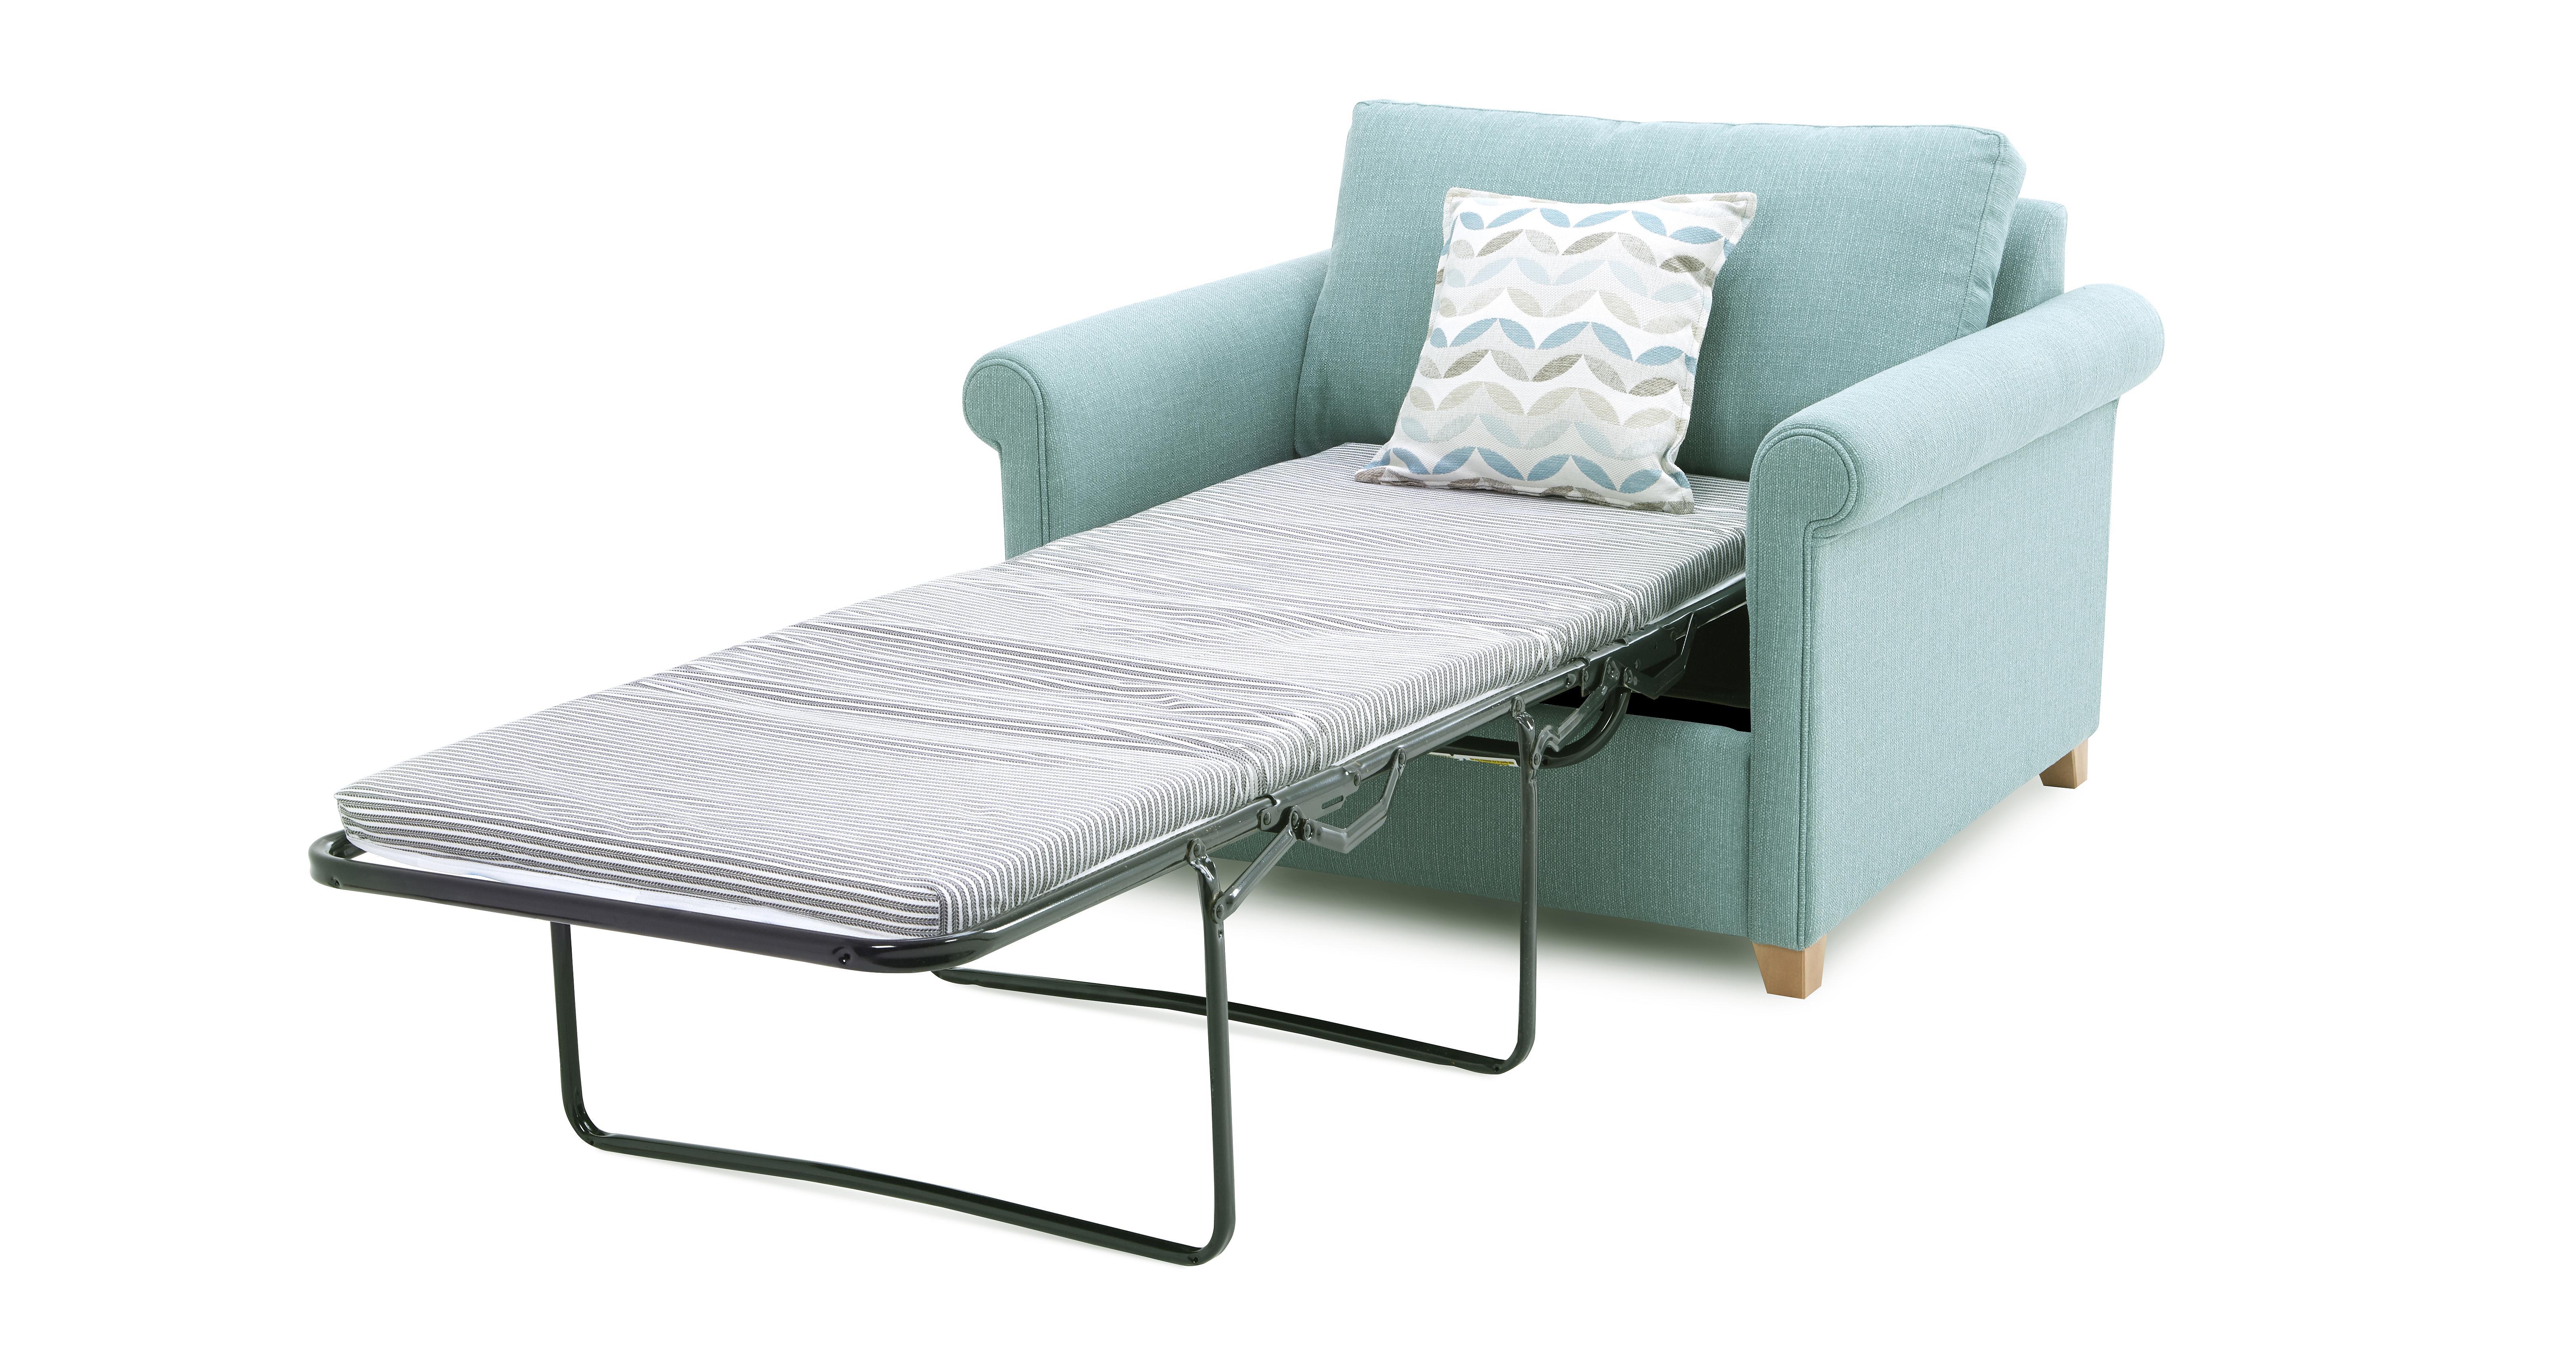 Anya Cuddler Sofa Bed DFS